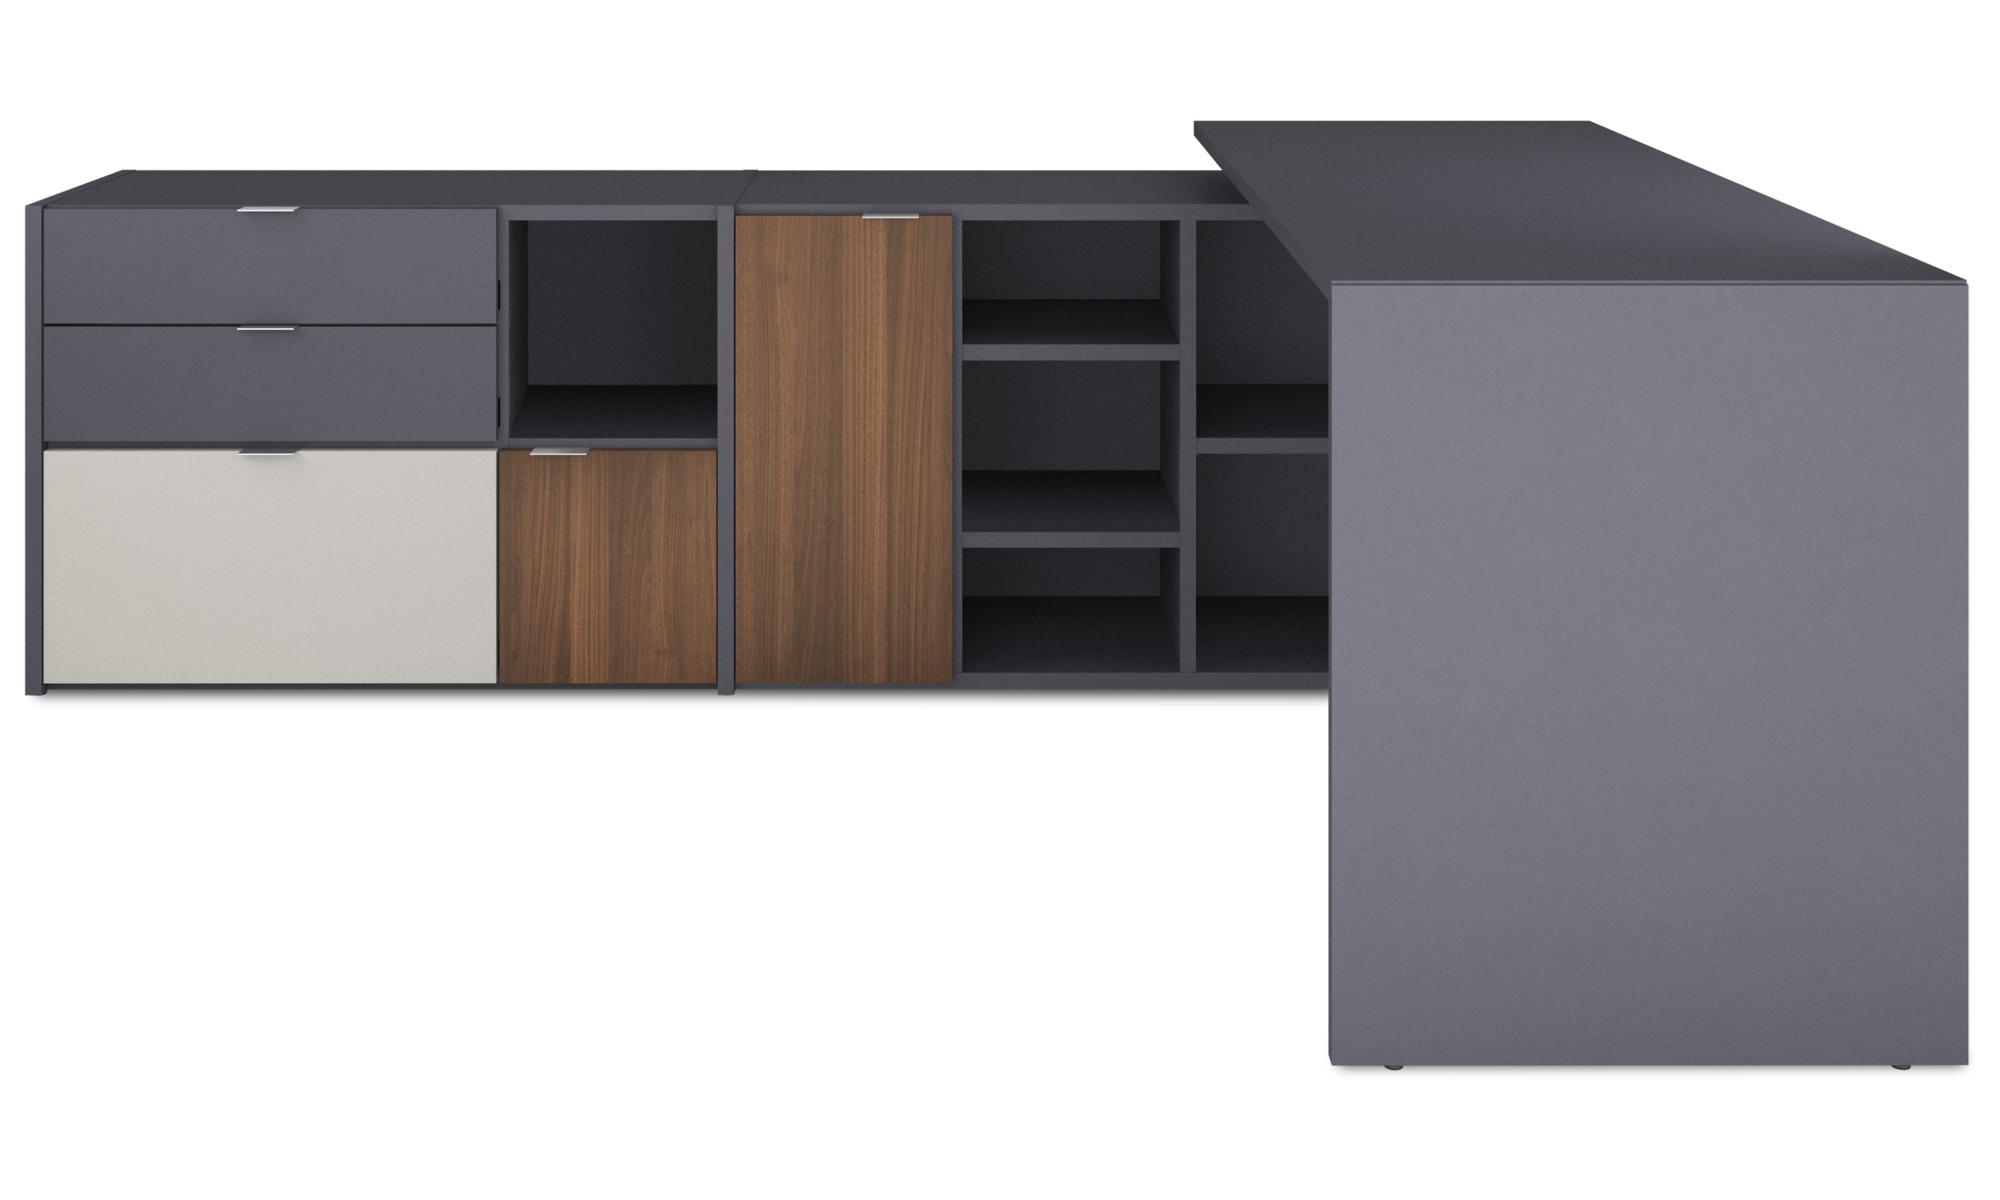 Desks - Copenhagen office system - Grey - Lacquered